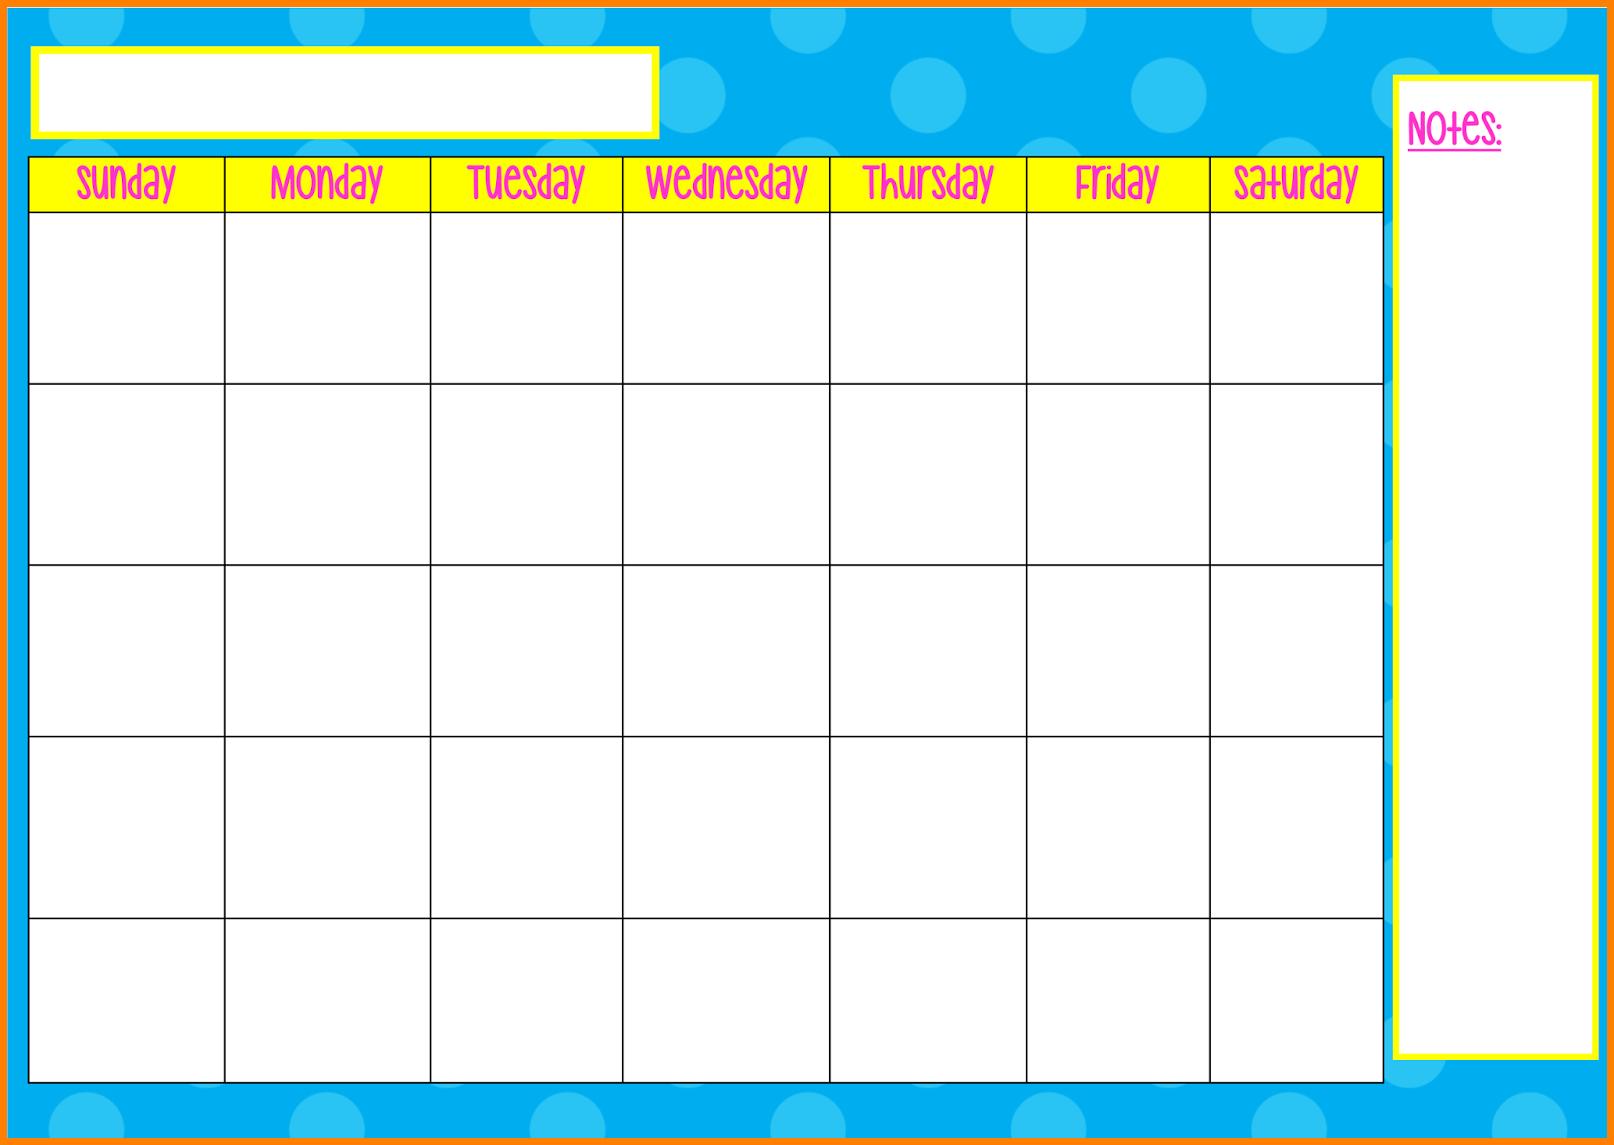 10+ Monday Thru Friday - Card Authorization 2017 Monday To Friday Template